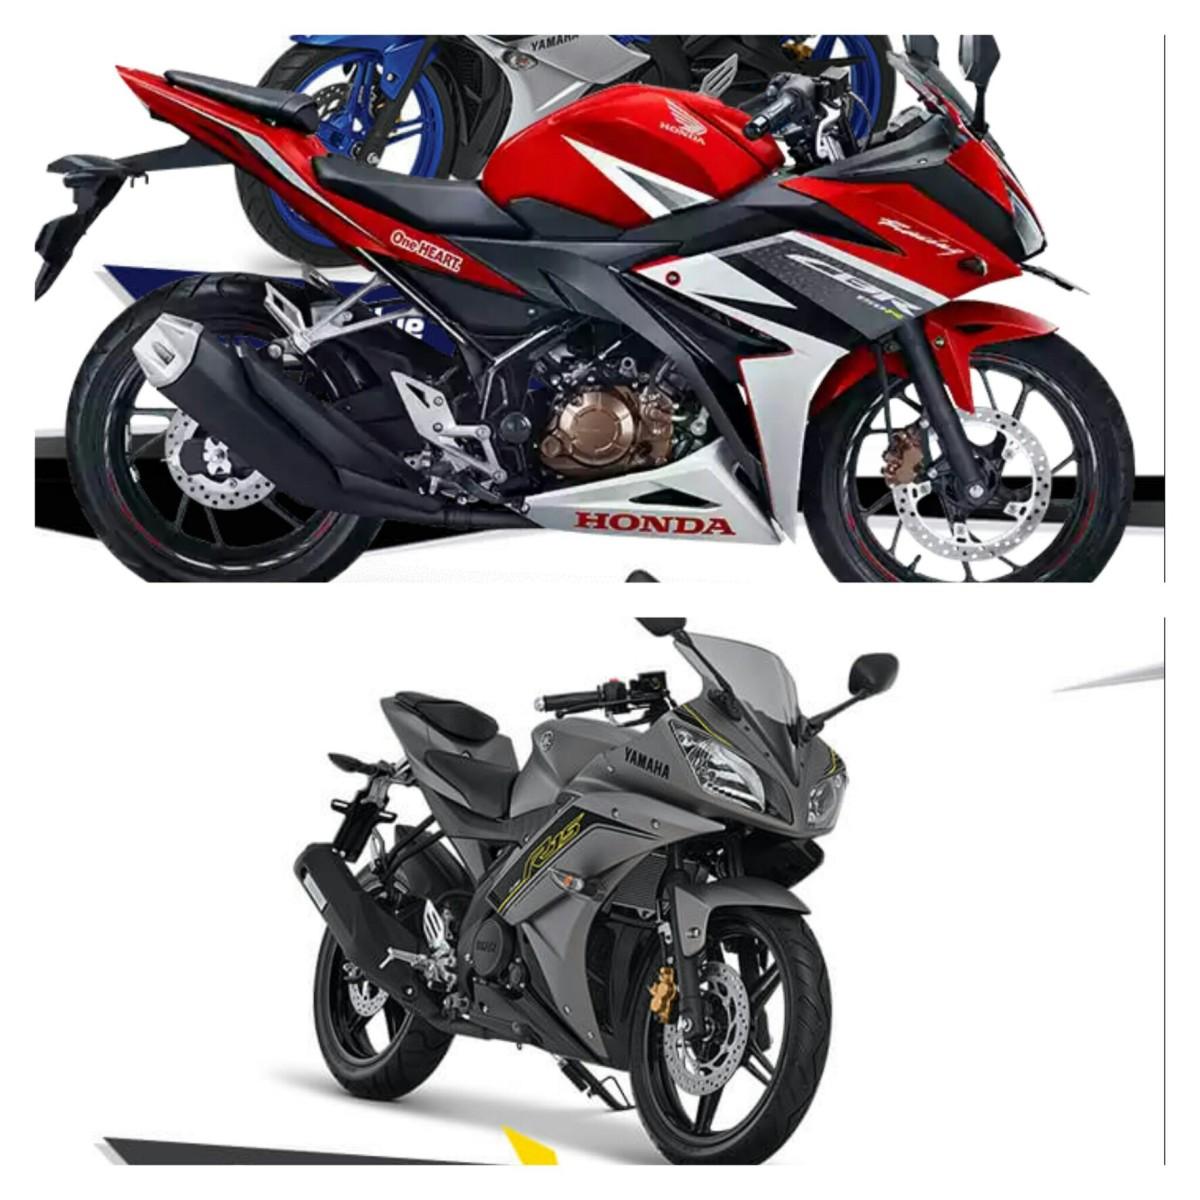 Data Aisi Maret 2016, Penjualan Sport CBR150R VS YZF R15 , Tipis !